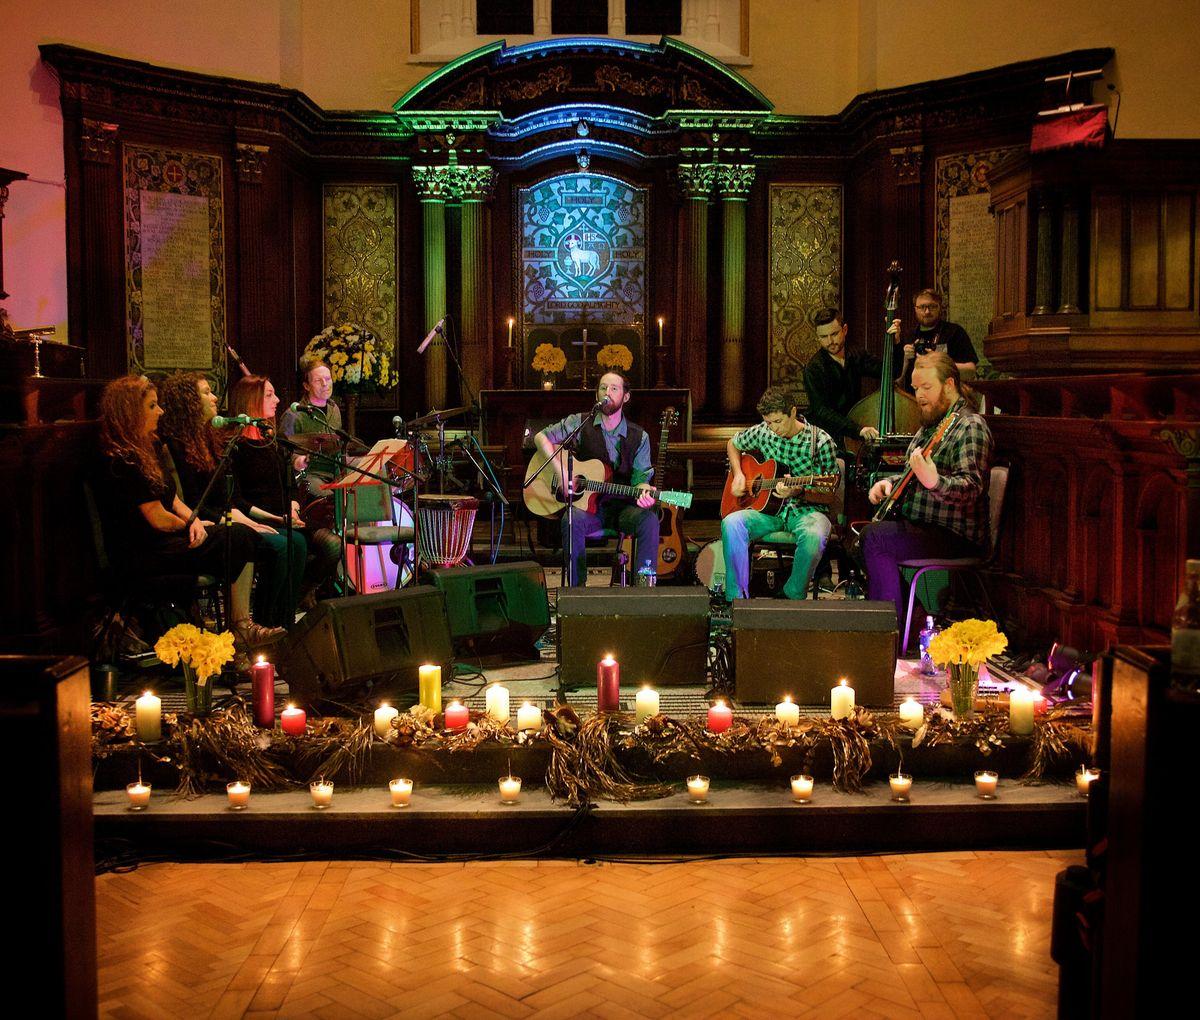 Niall Mc Guigan & Friends - Album Launch - Spiritual Anarchy